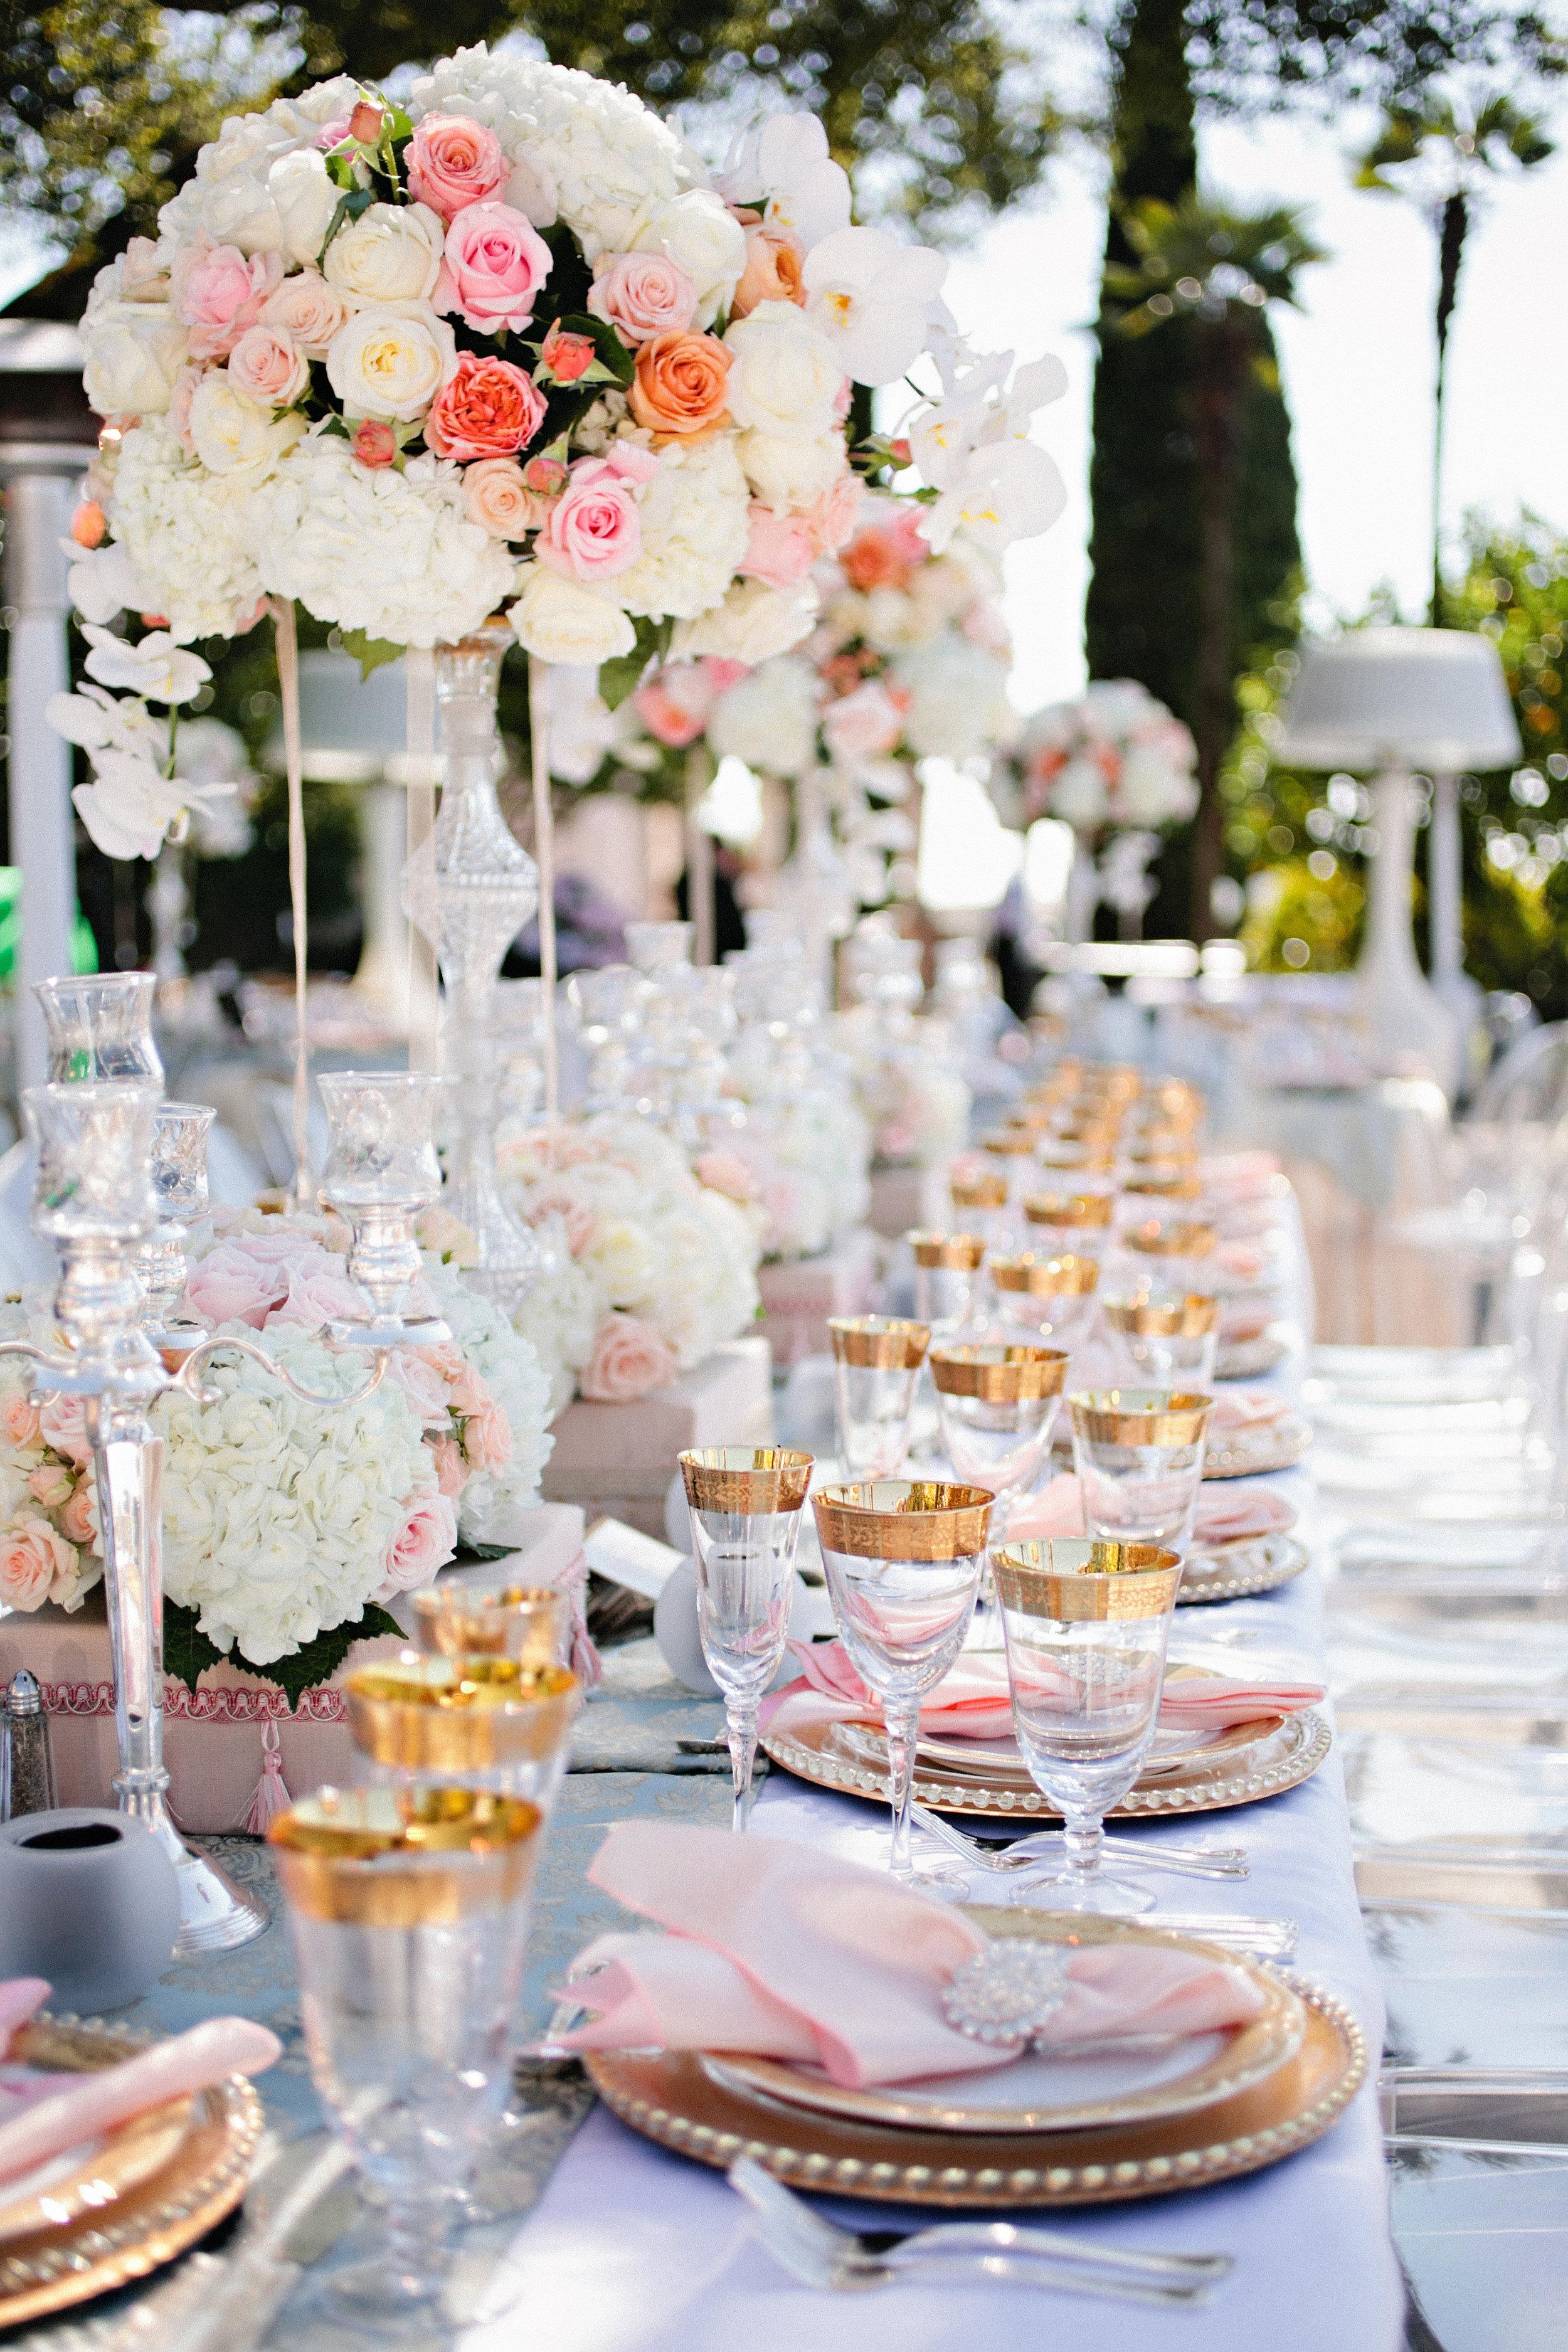 9090_linda_vu_wedding-1616978250-O.jpg